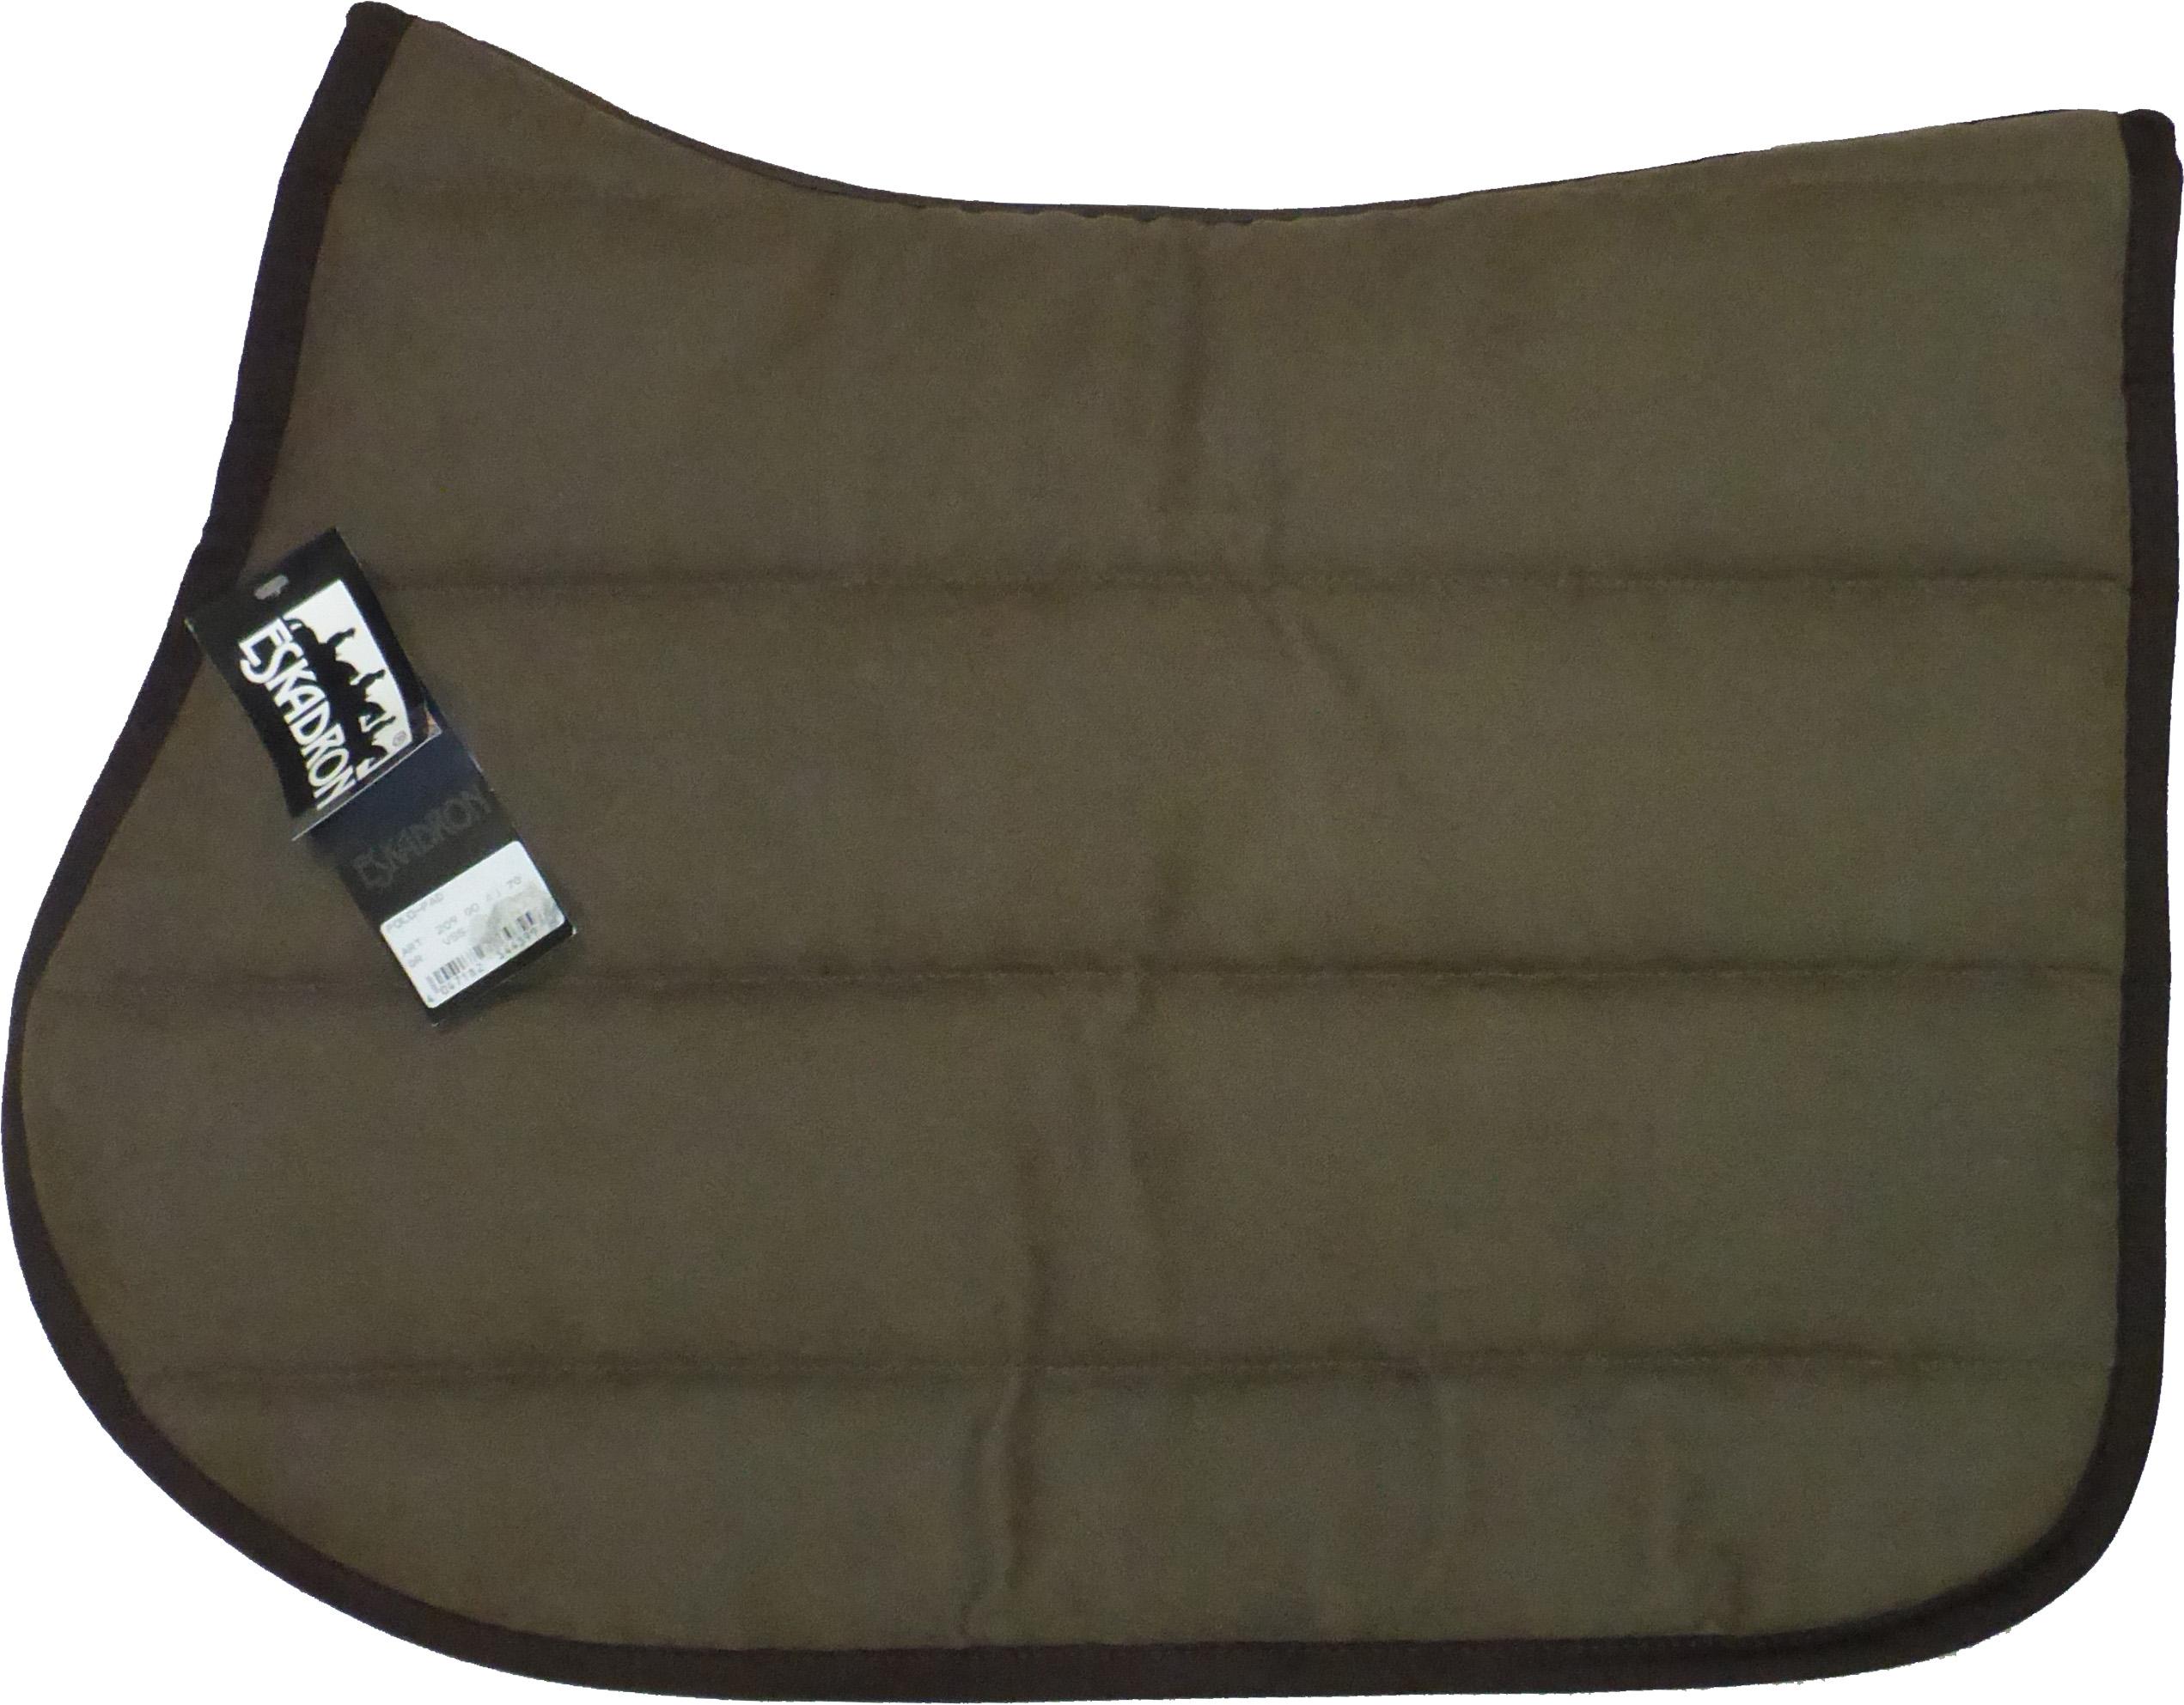 Eskadron Sattelpad mit Rückenform in schoko, Polo Pad Größe VS